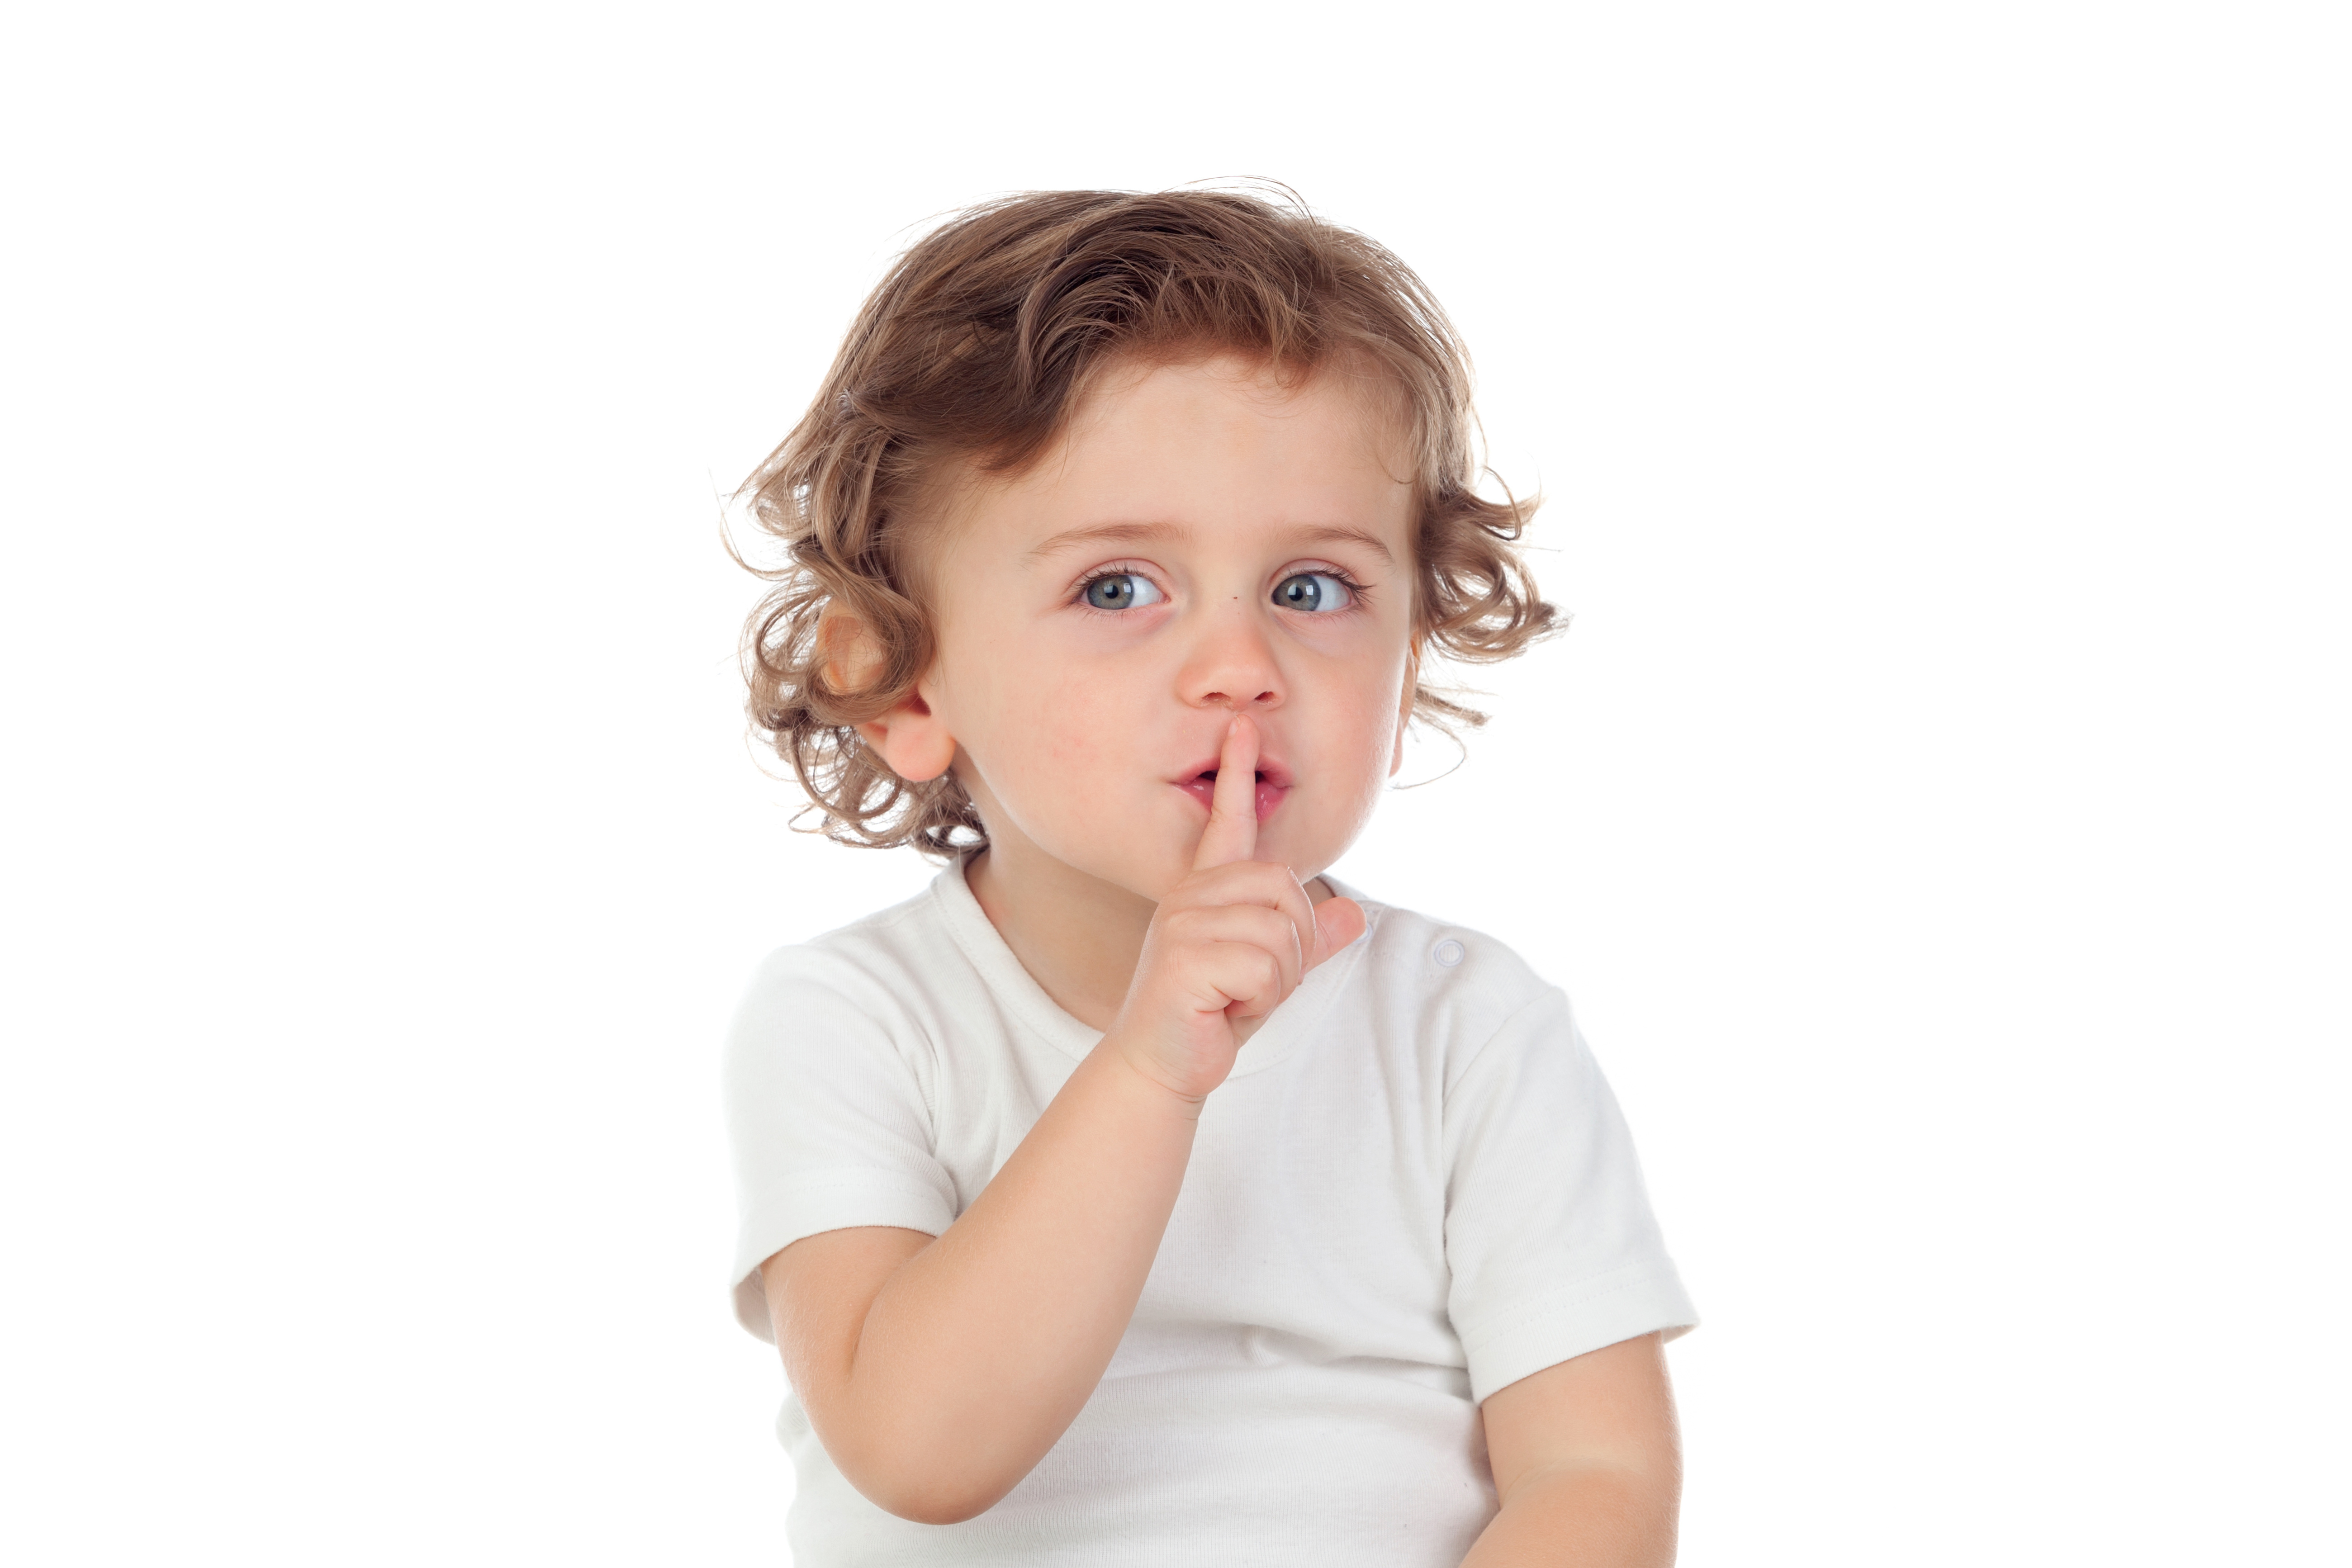 Psicóloga especialista en problemas de habla infantil